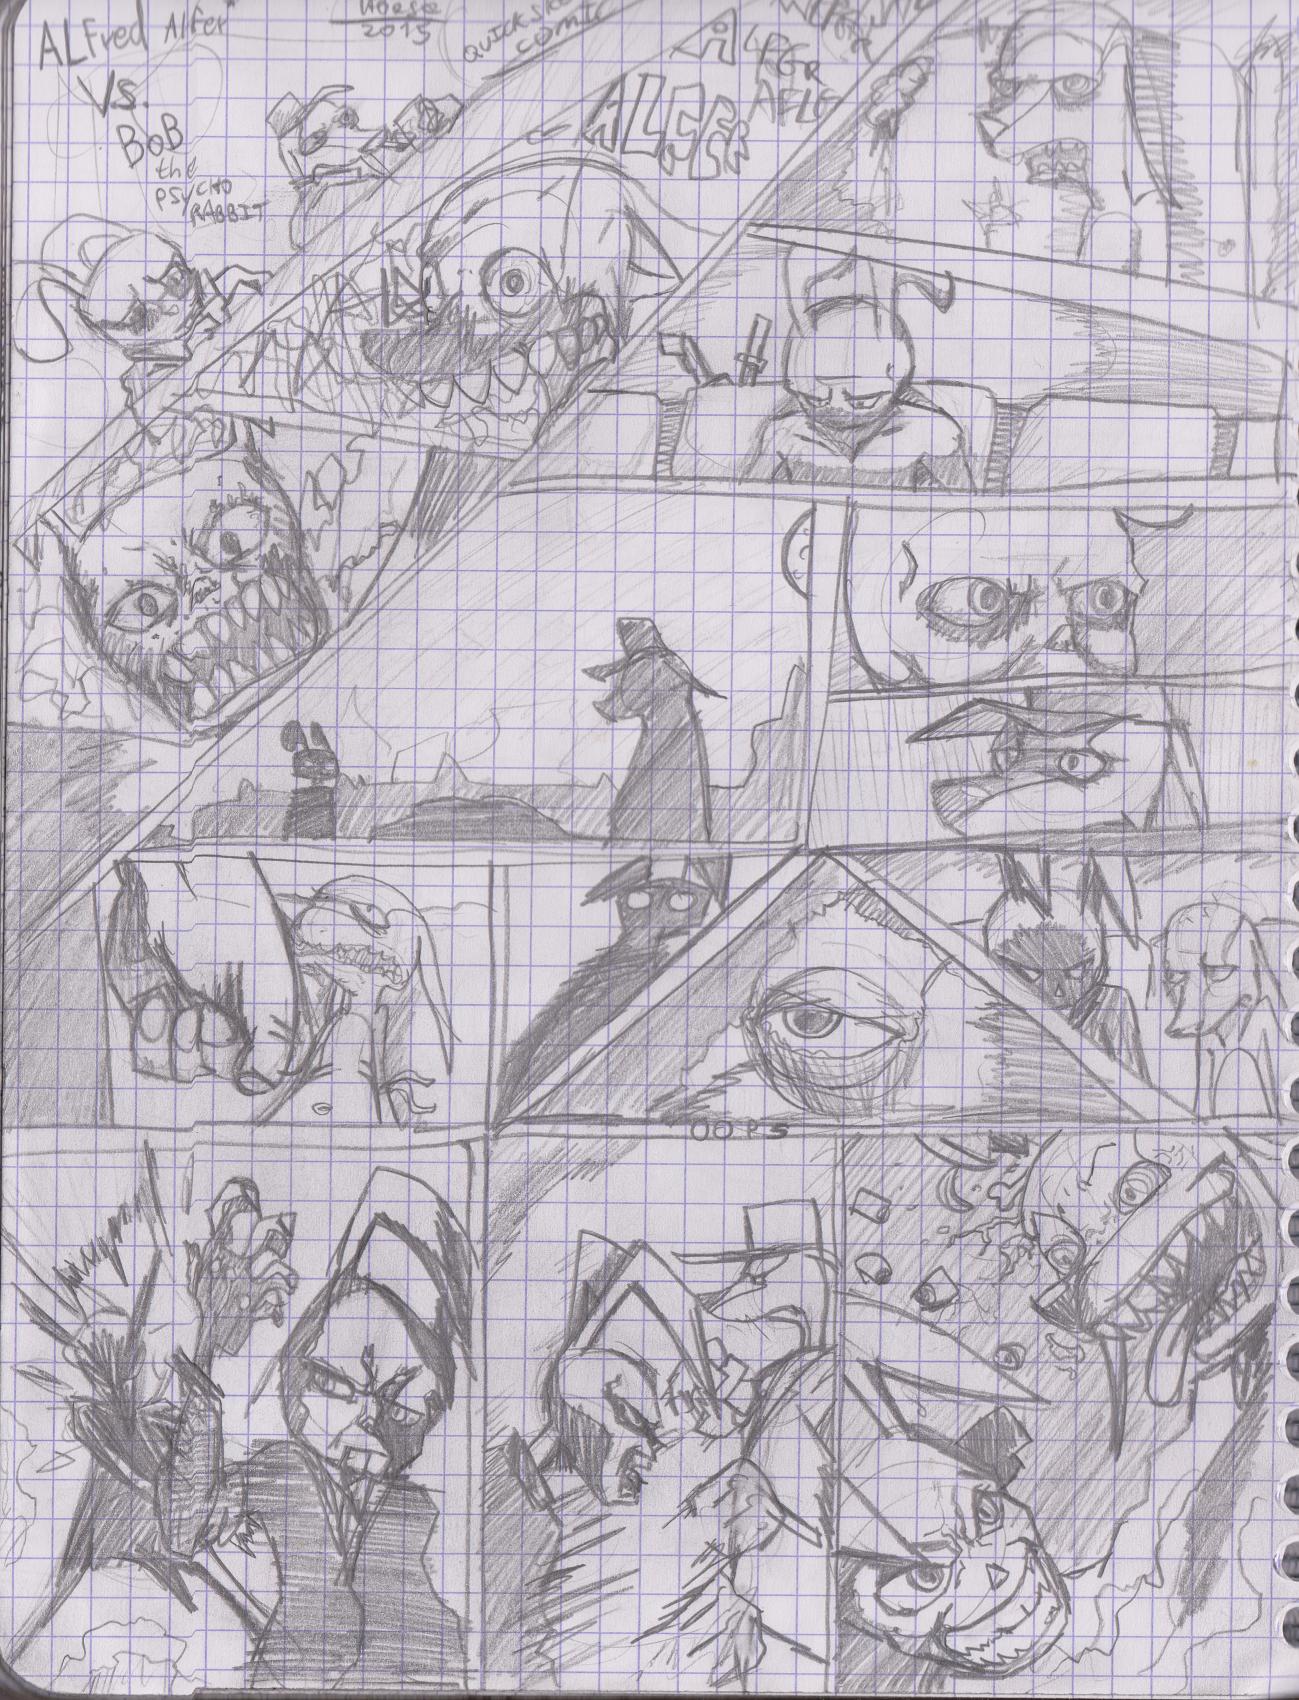 SH sketchbook page 59